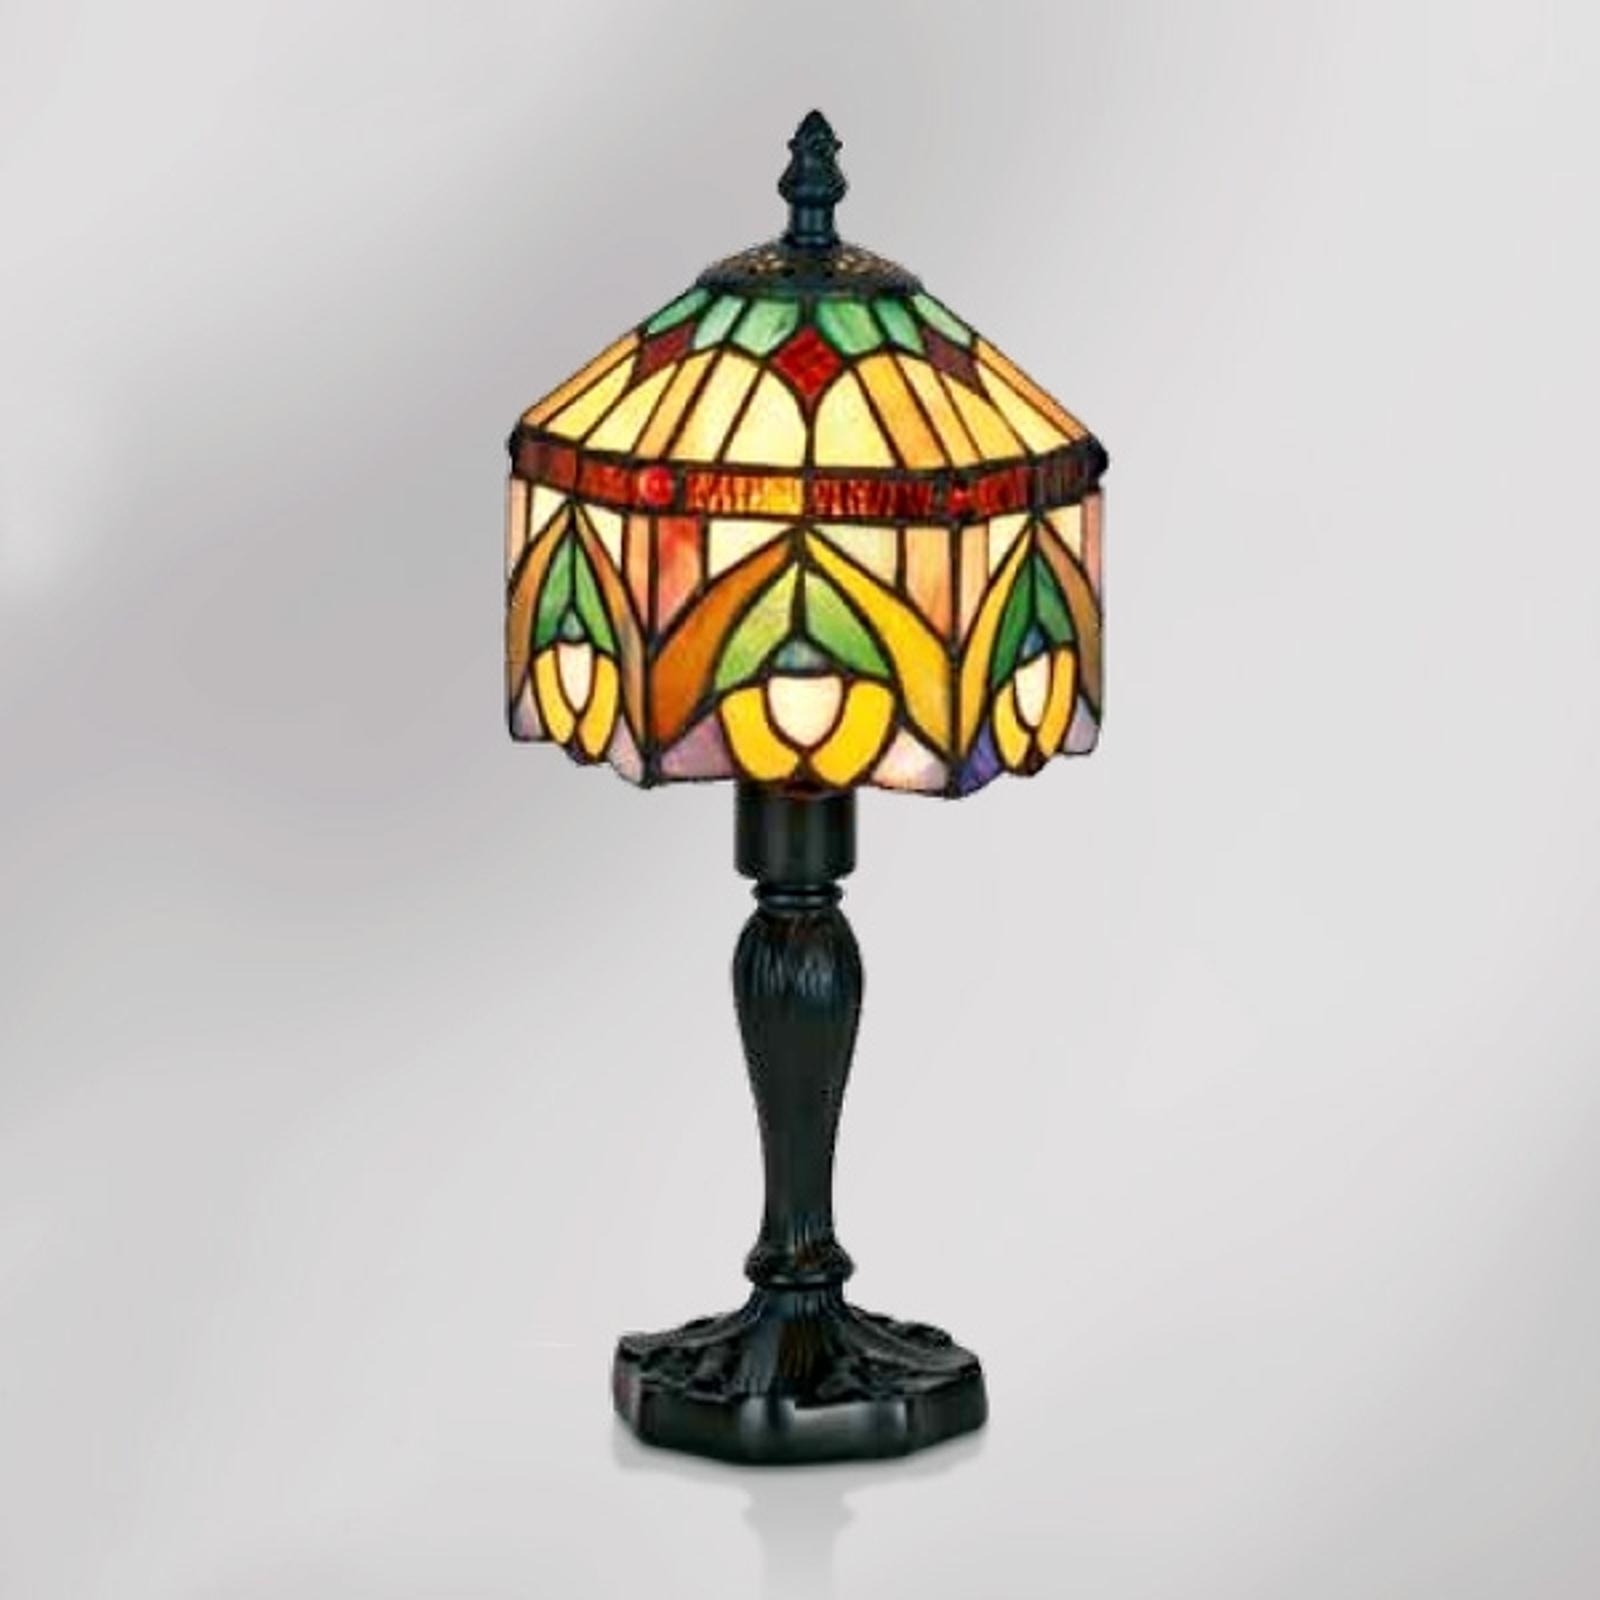 Decorative table lamp Jamilia in Tiffany style_1032267_1